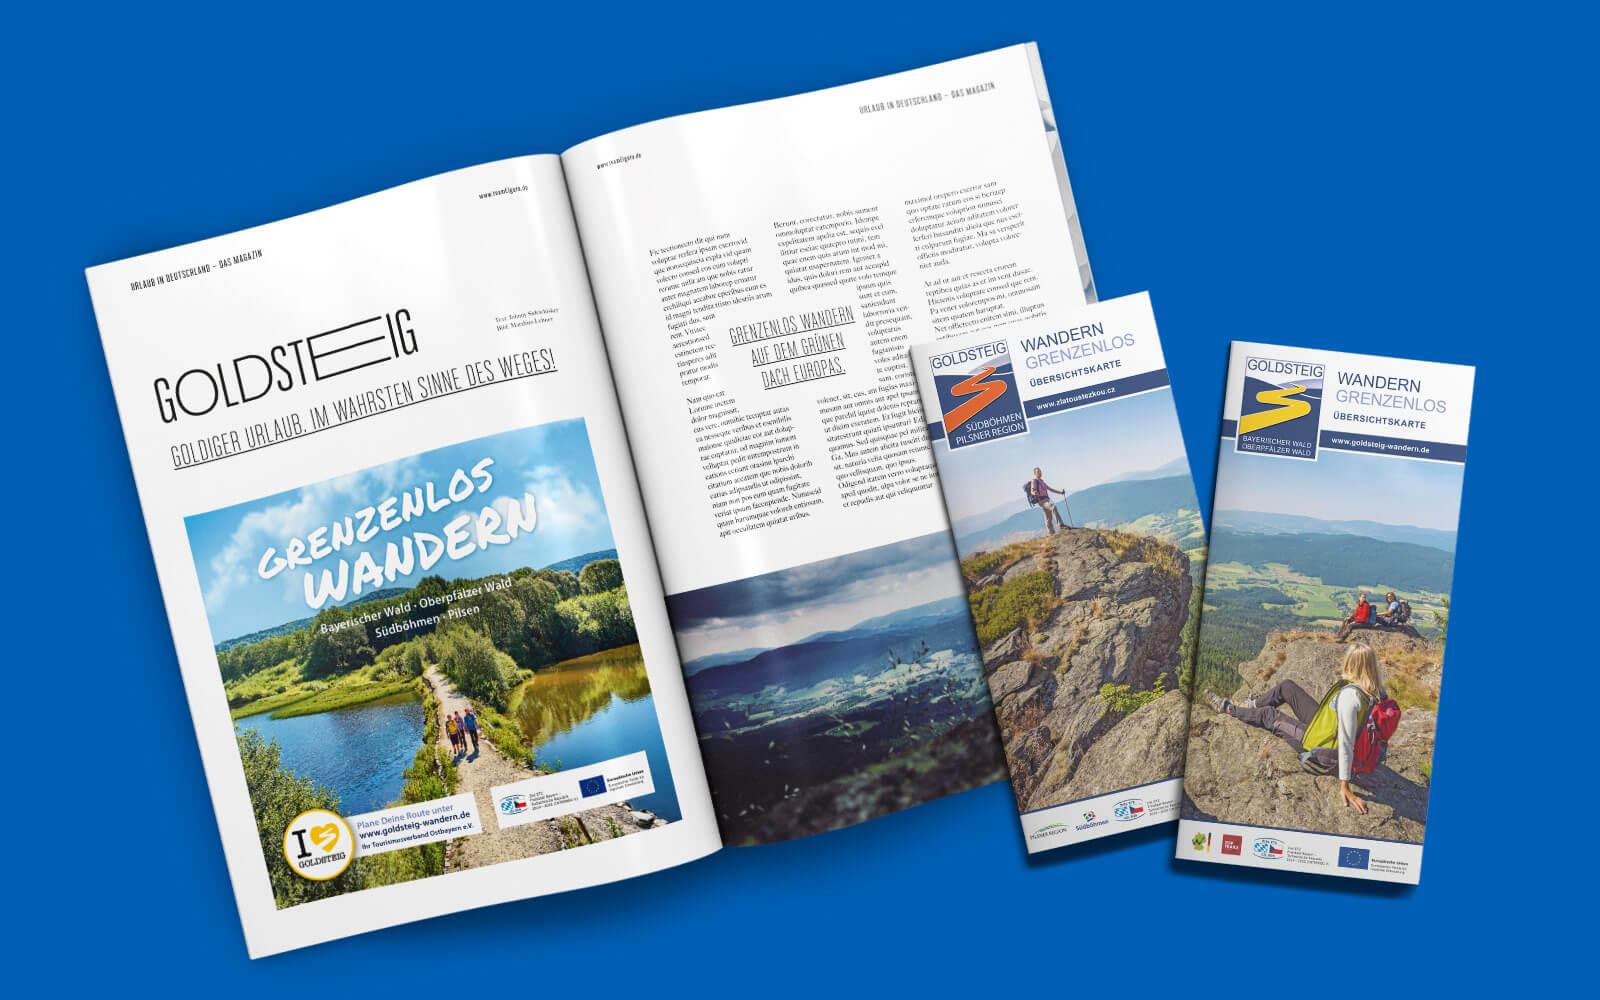 Ostbayern Tourismus – Goldsteig Wandern